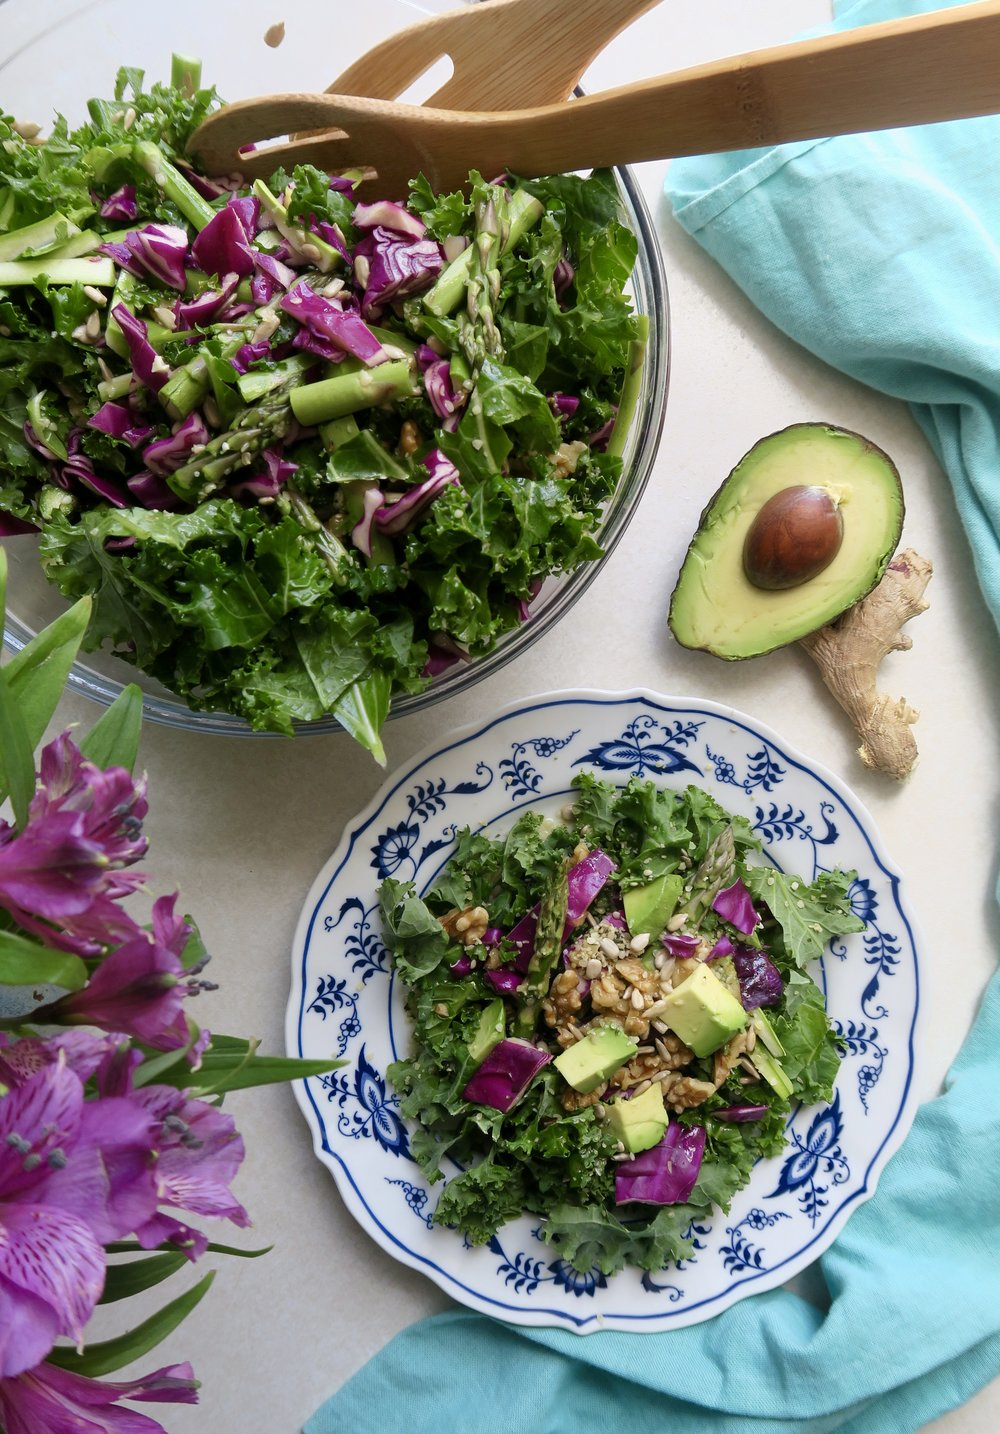 Lake Superior kitchen, kale salad, detox salad, Duluth food, paleo